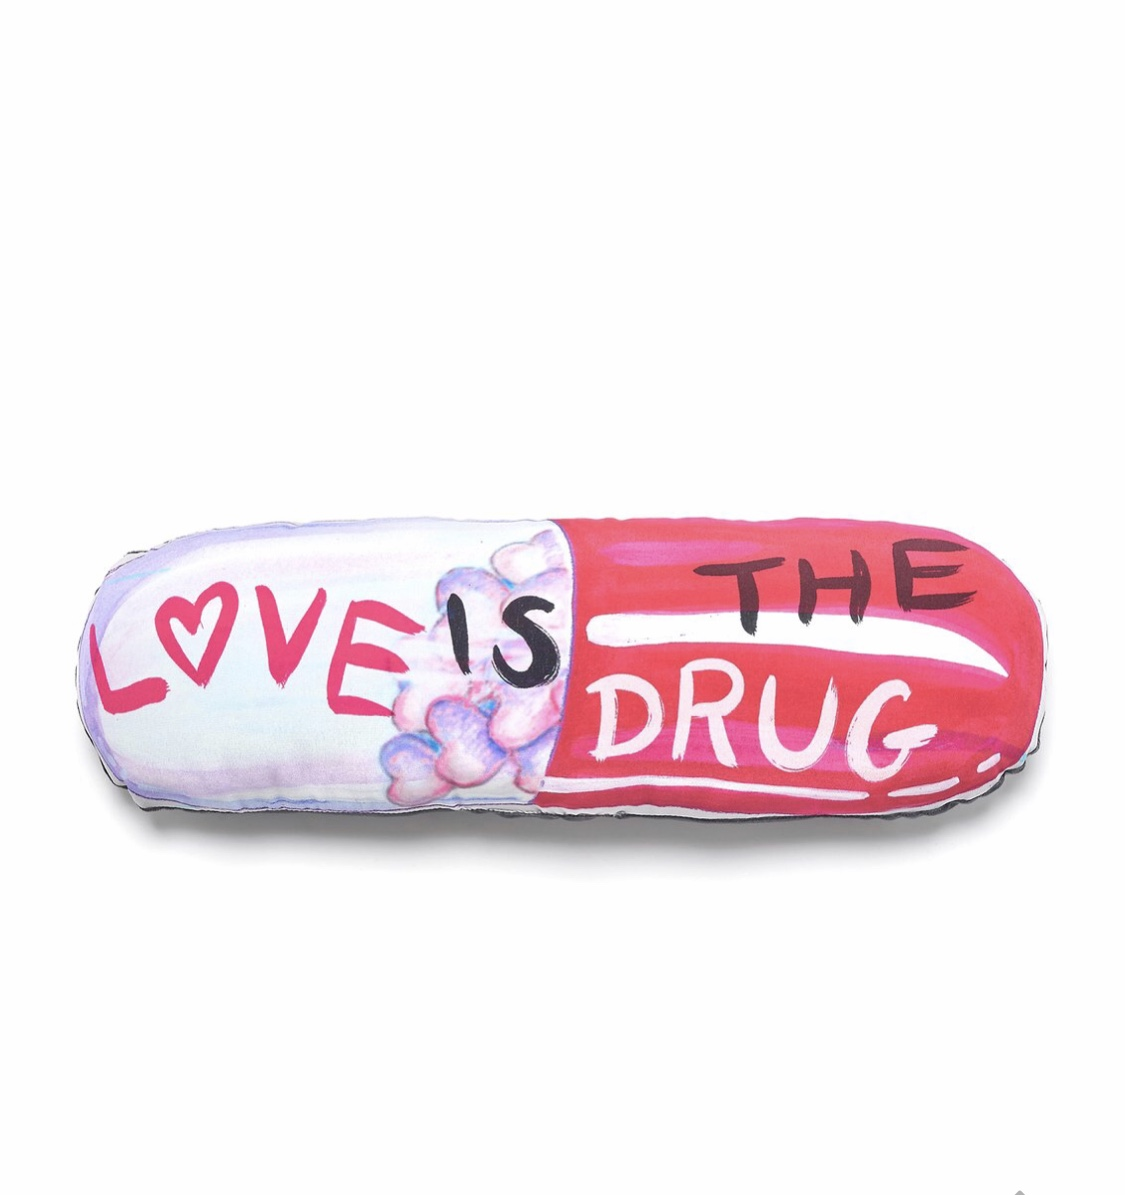 Love is the Drug cushion @ageofreasonstudios